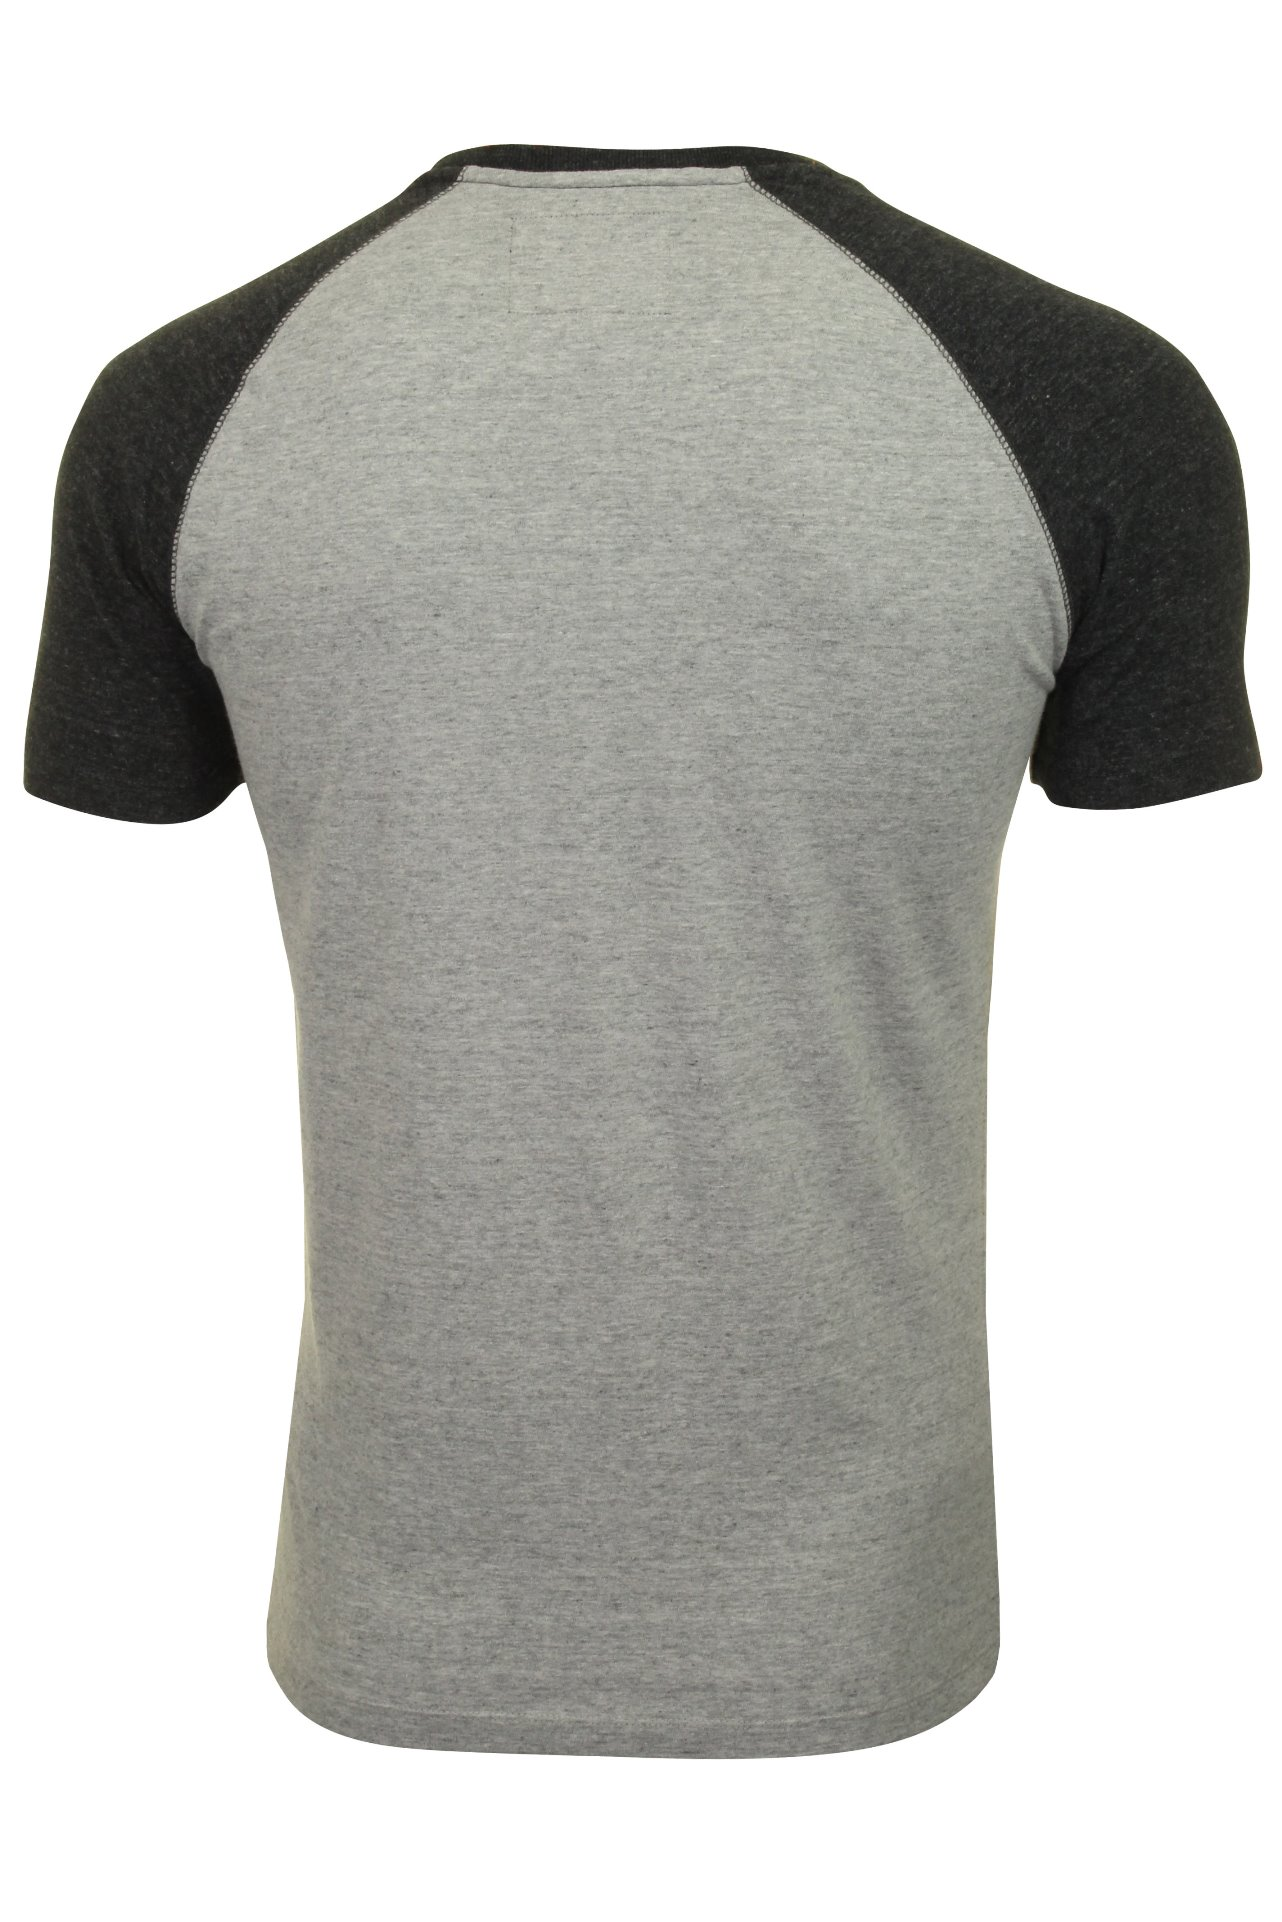 Superdry-Mens-039-Baseball-039-Raglan-Short-Sleeved-T-Shirt thumbnail 11